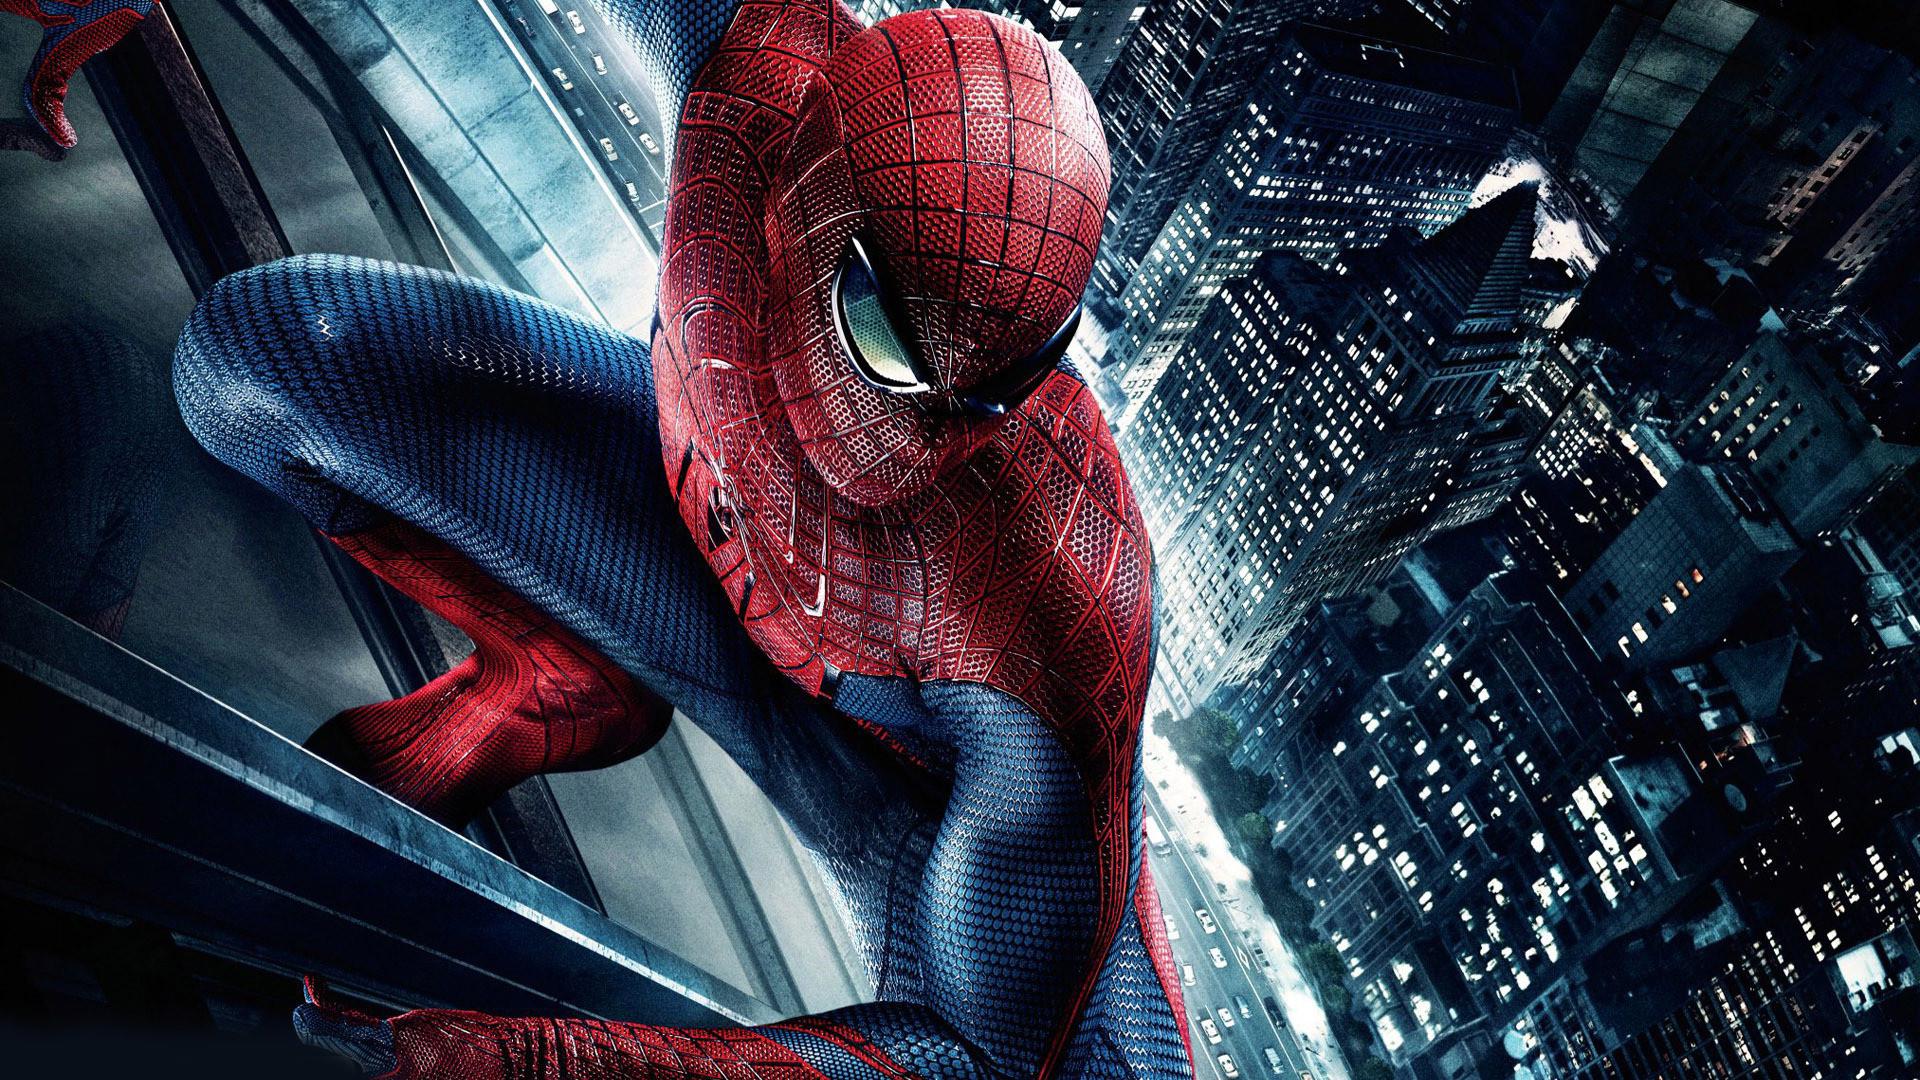 4k Spiderman Wallpaper 55 Images